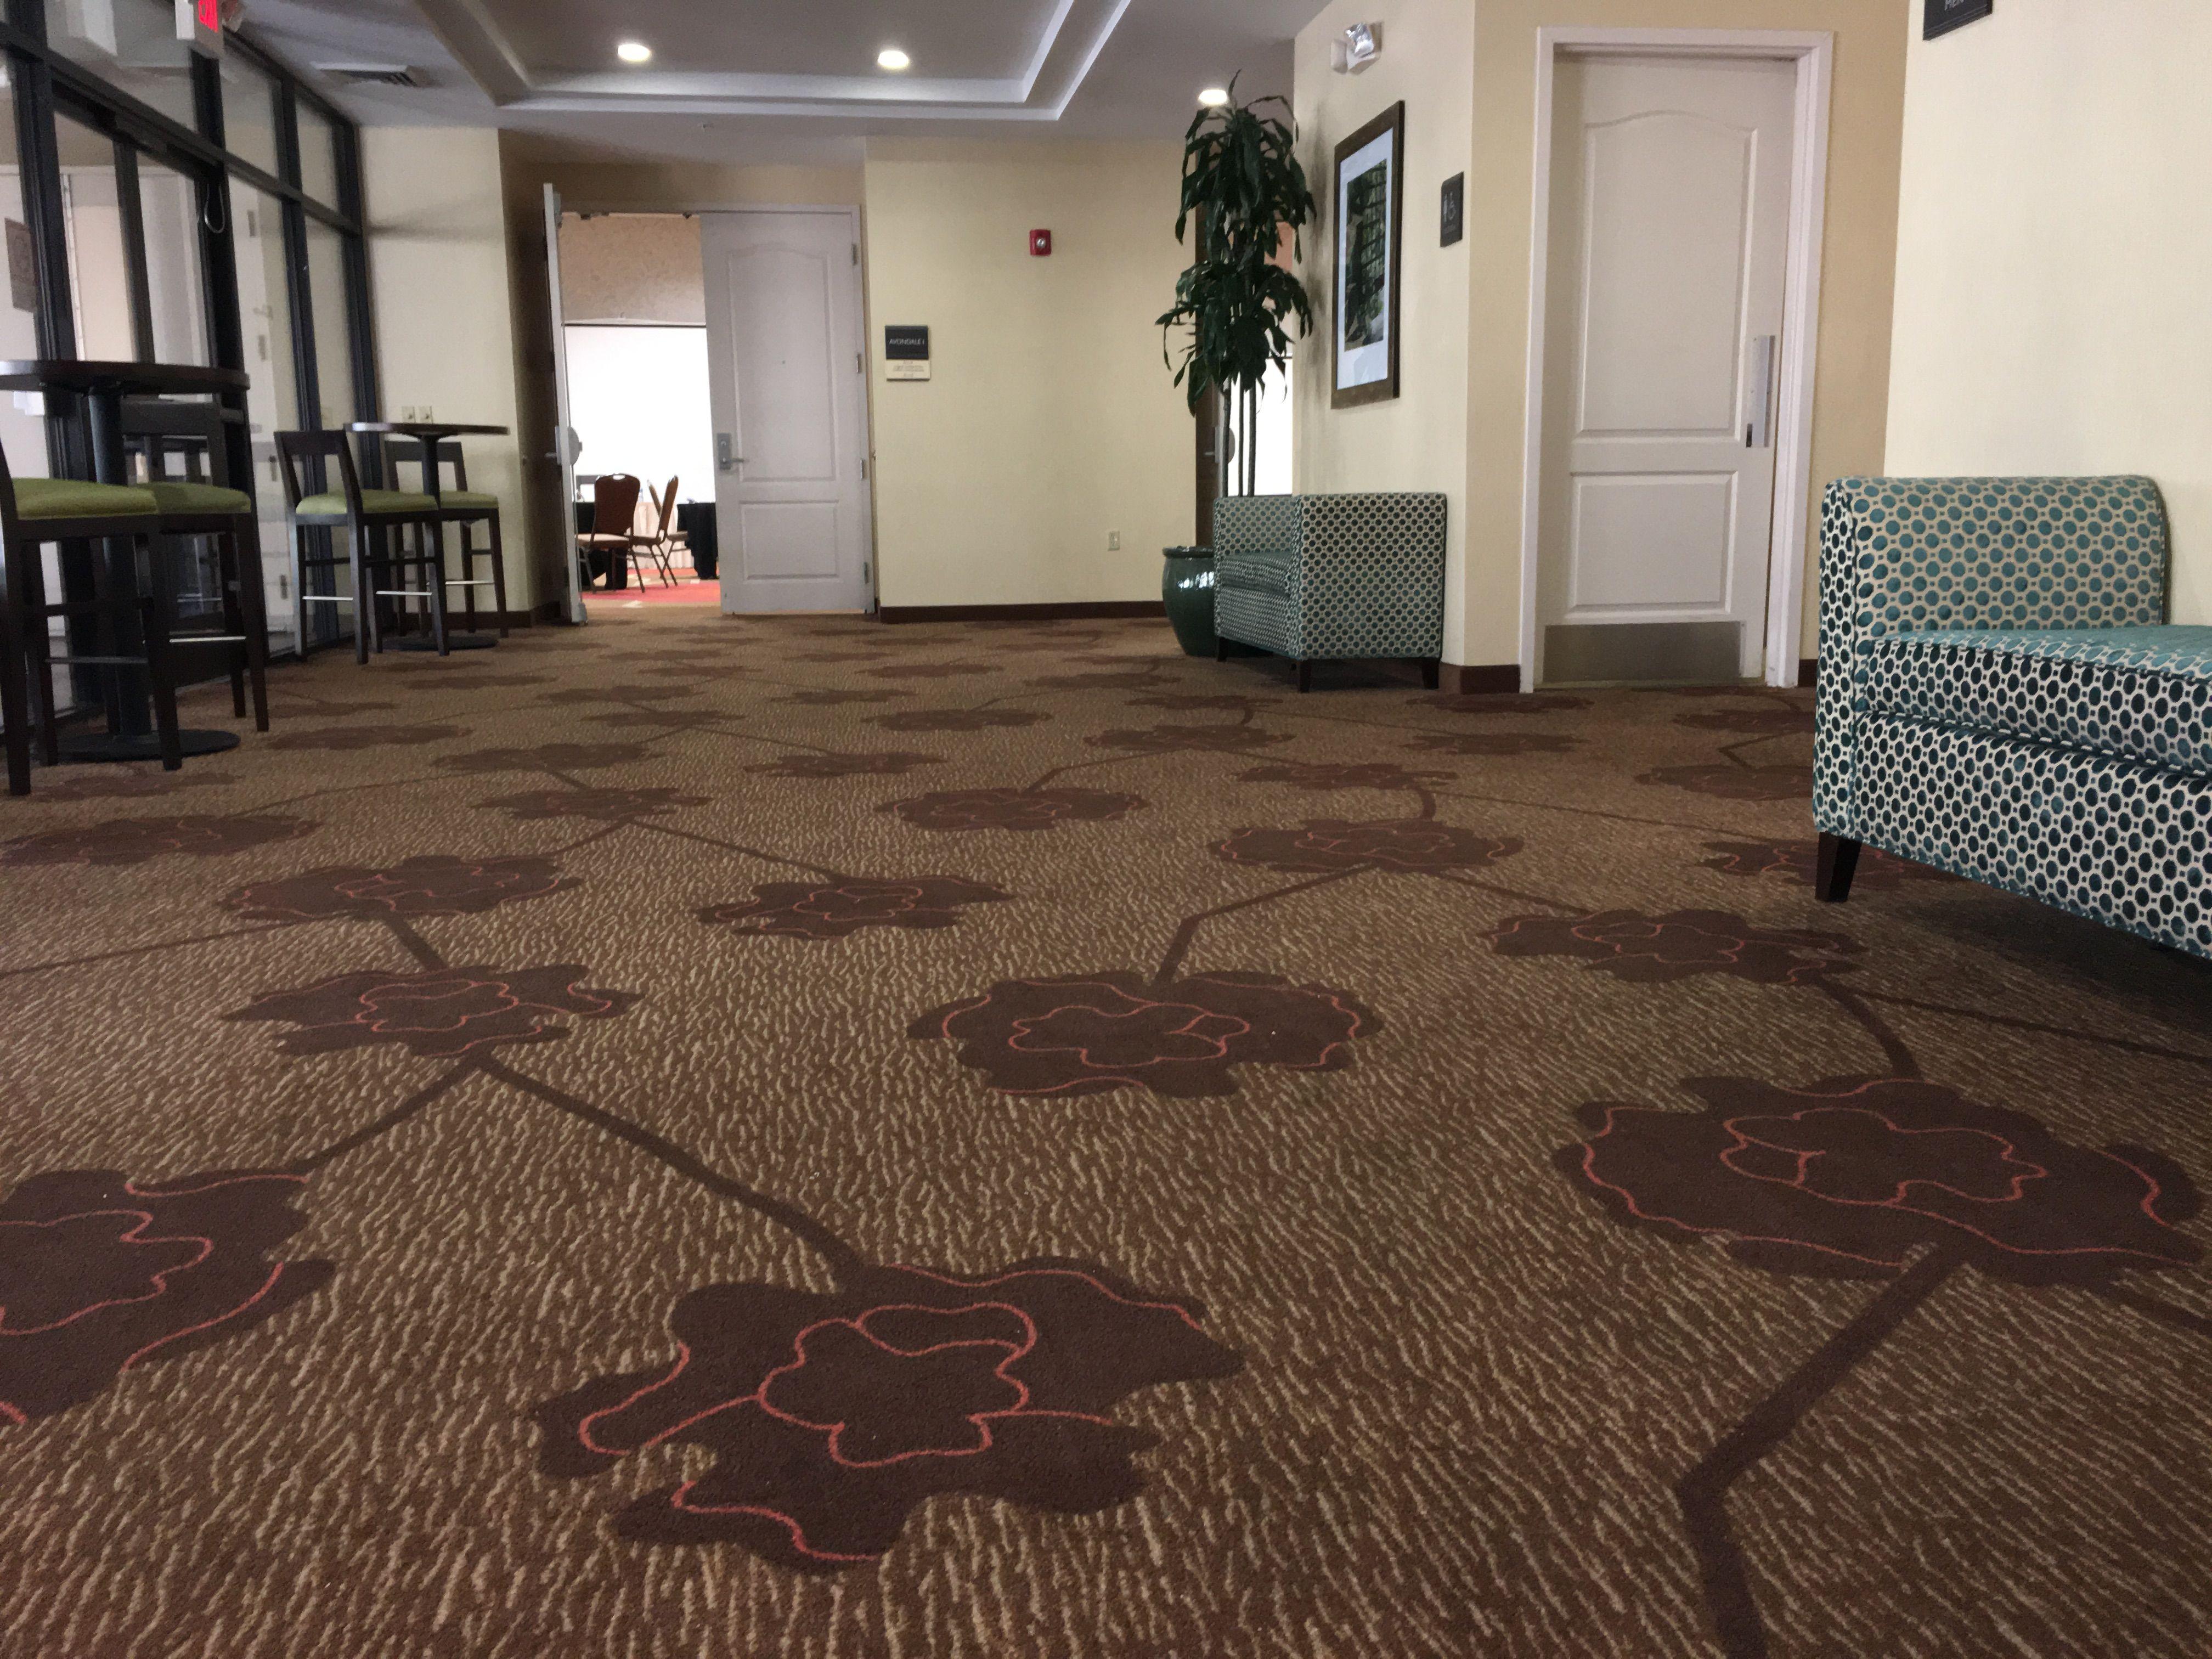 Commercial Carpet Cleaning Service in Phoenix AZ